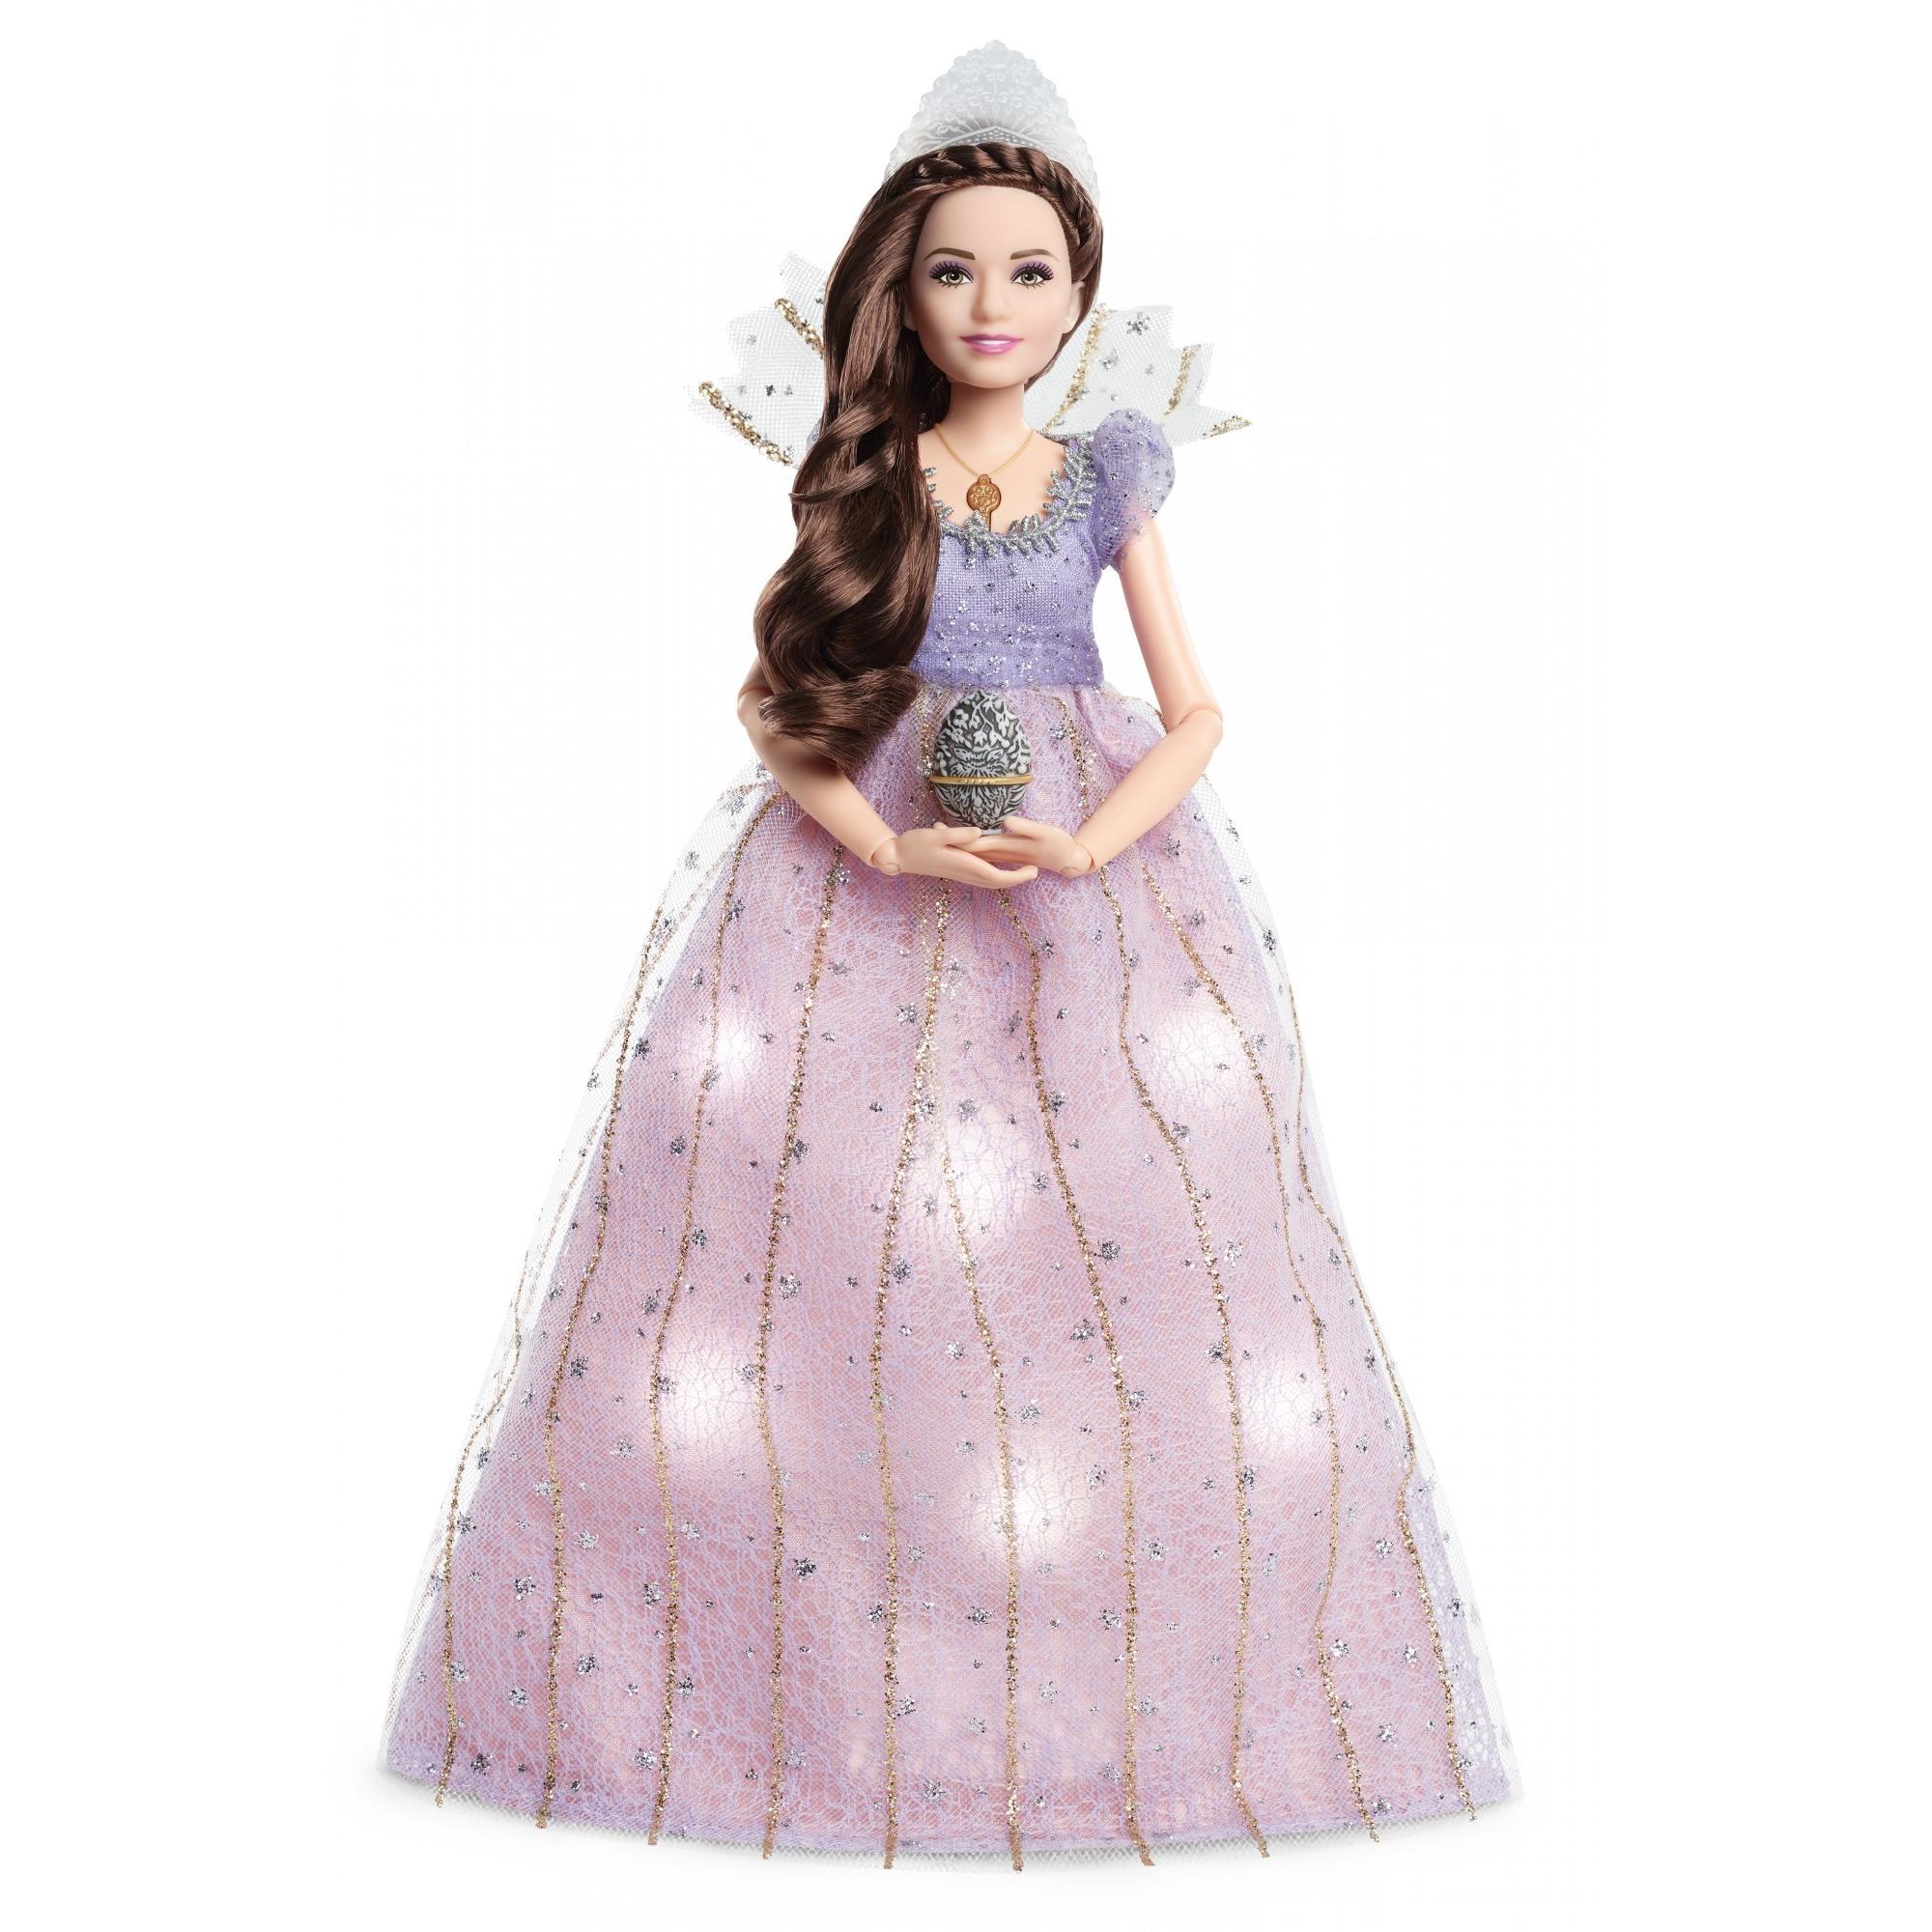 Barbie The Nutcracker and the Four Realms Clara Doll